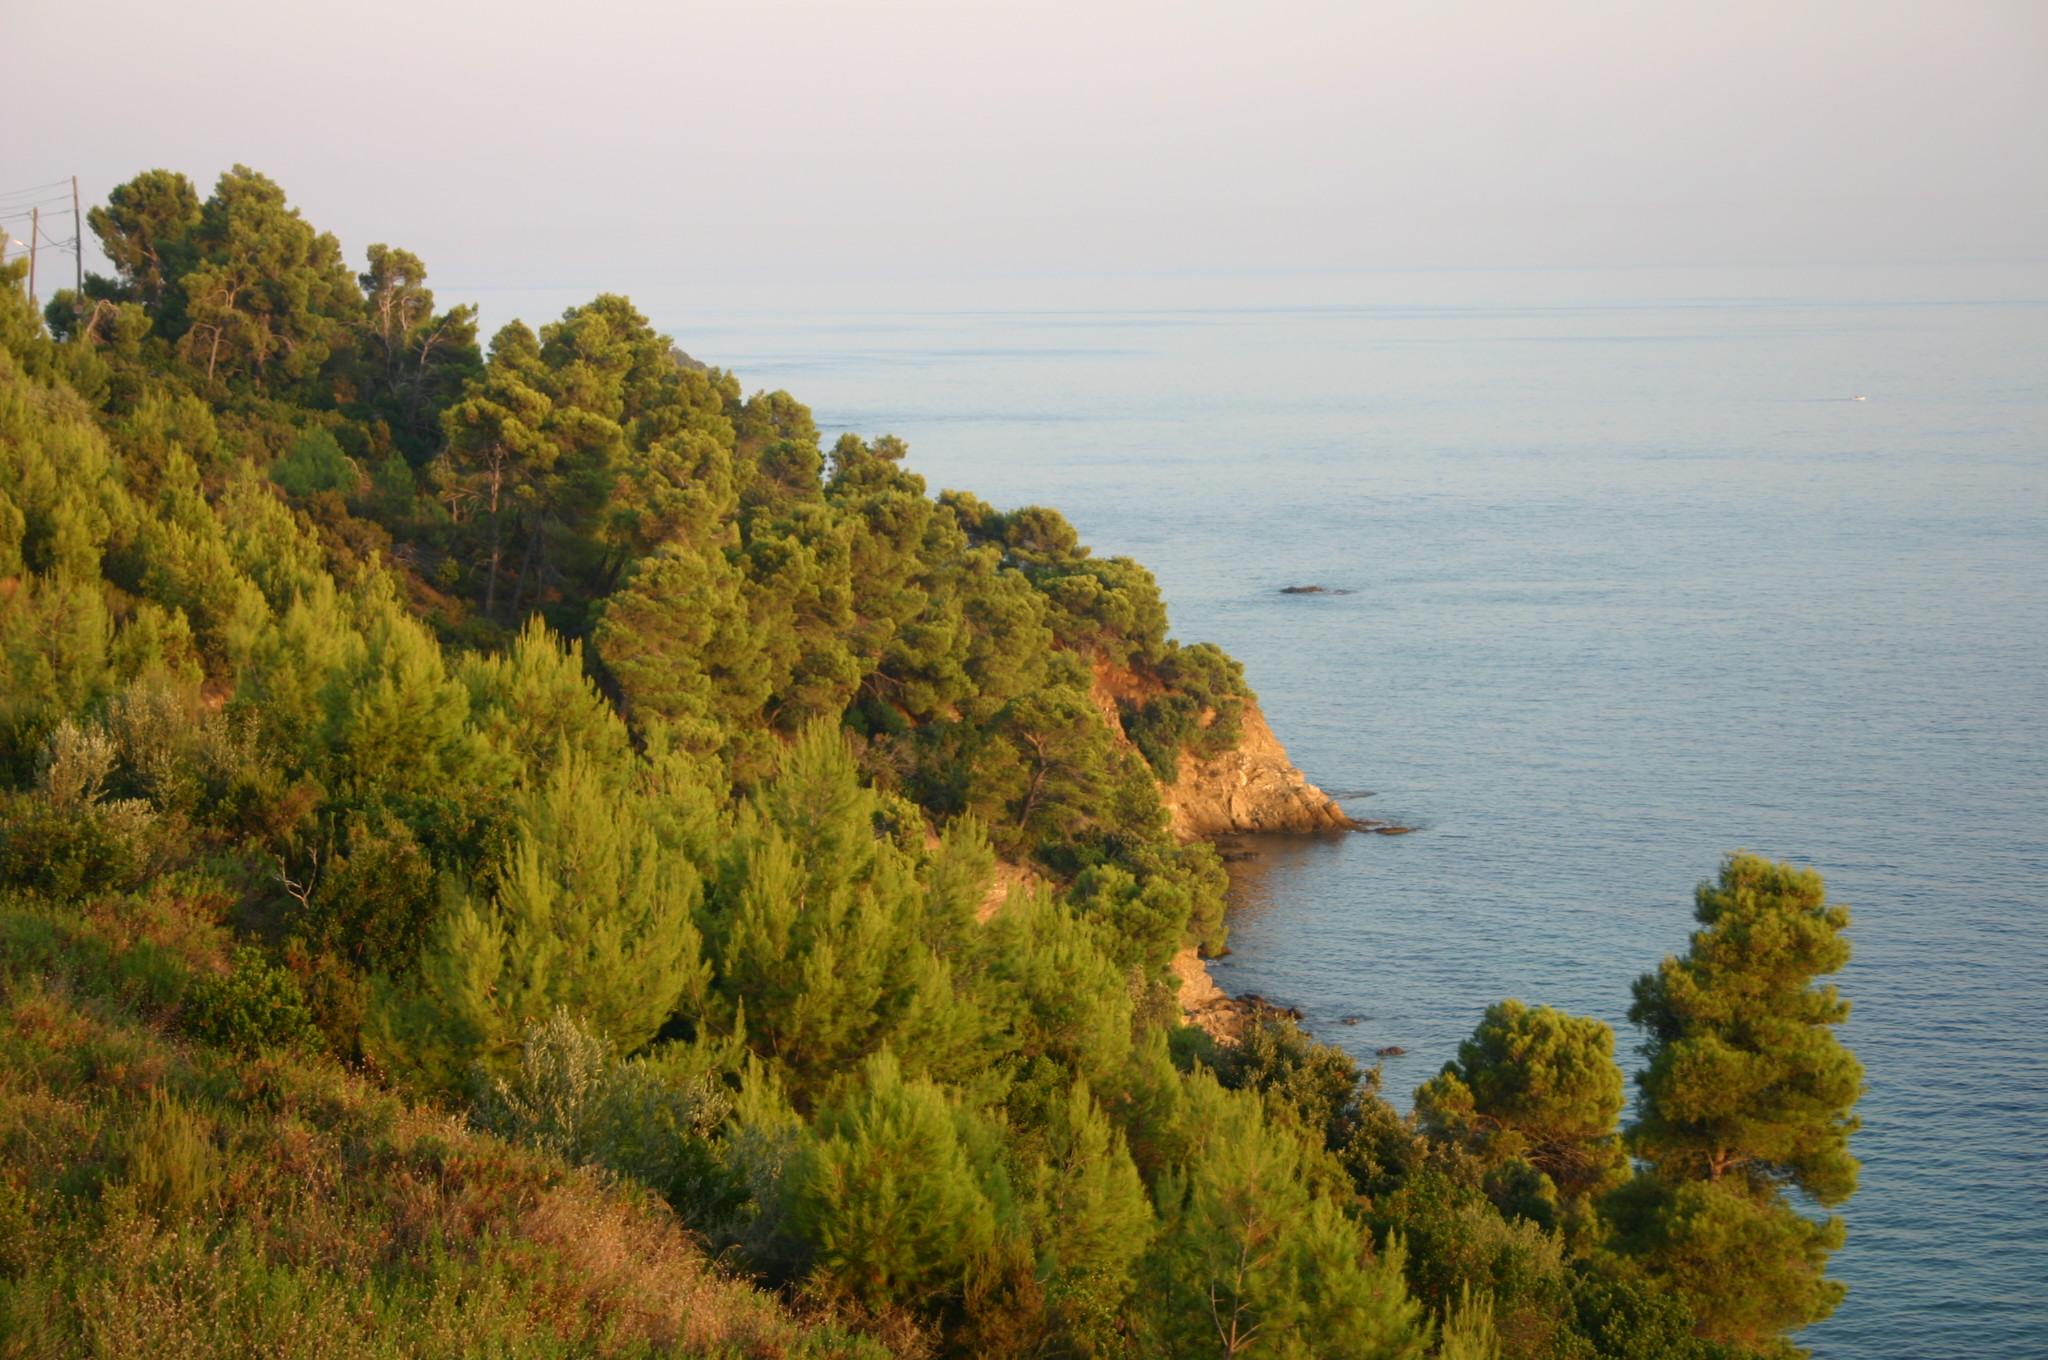 Cape Amoni